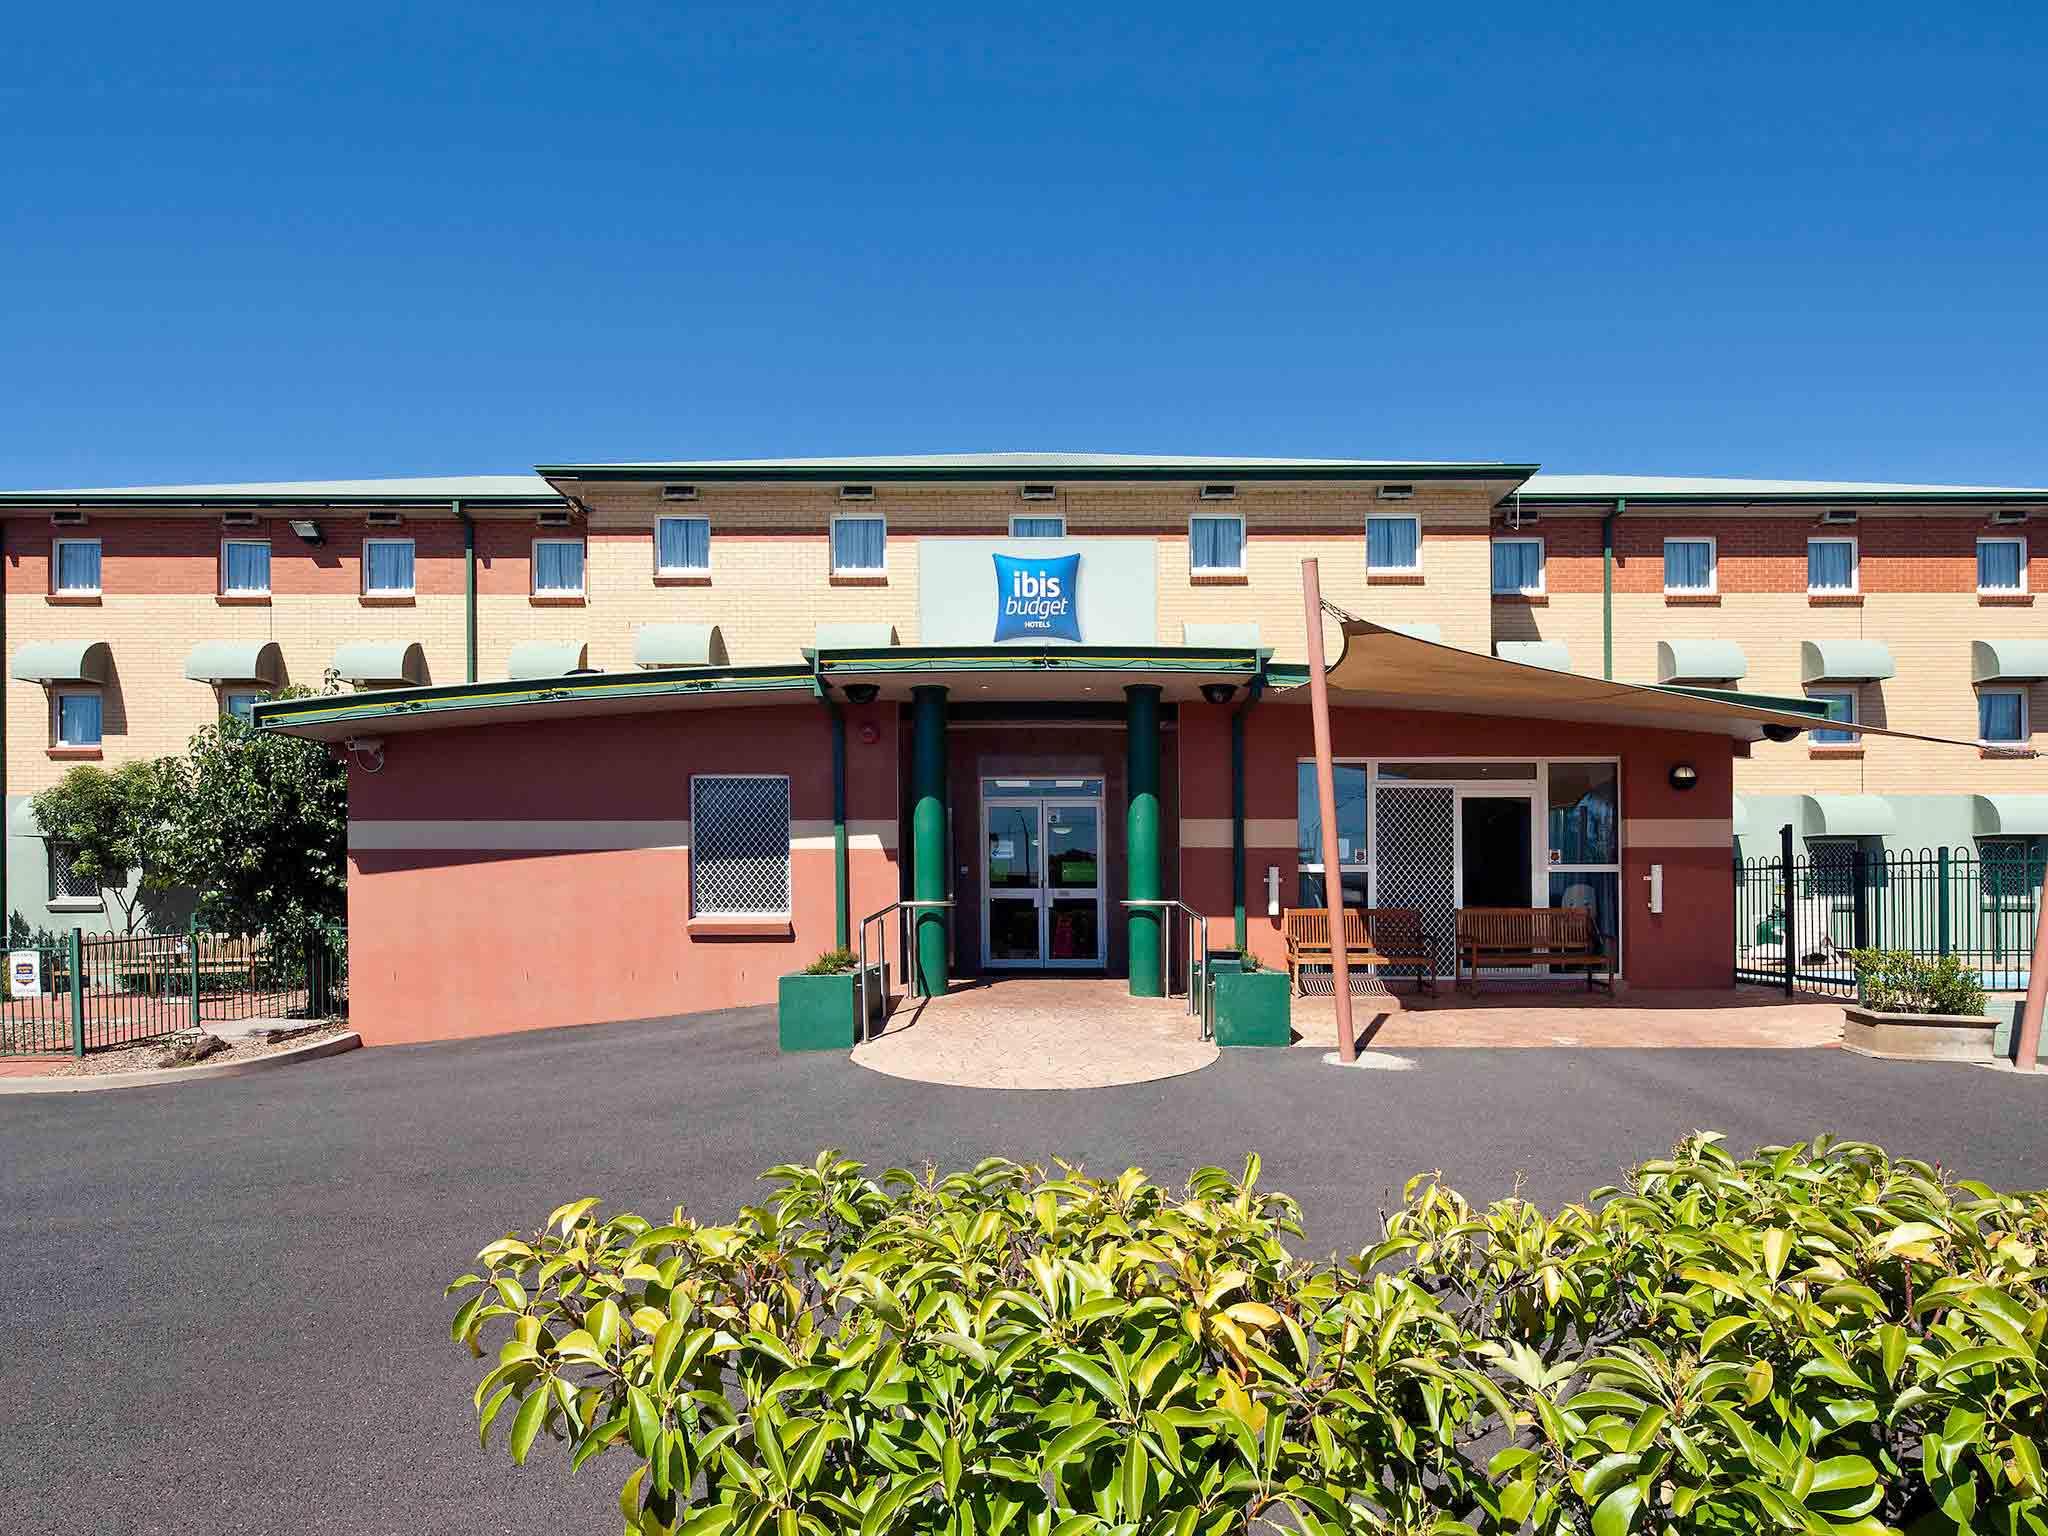 Hotell – ibis budget Dubbo